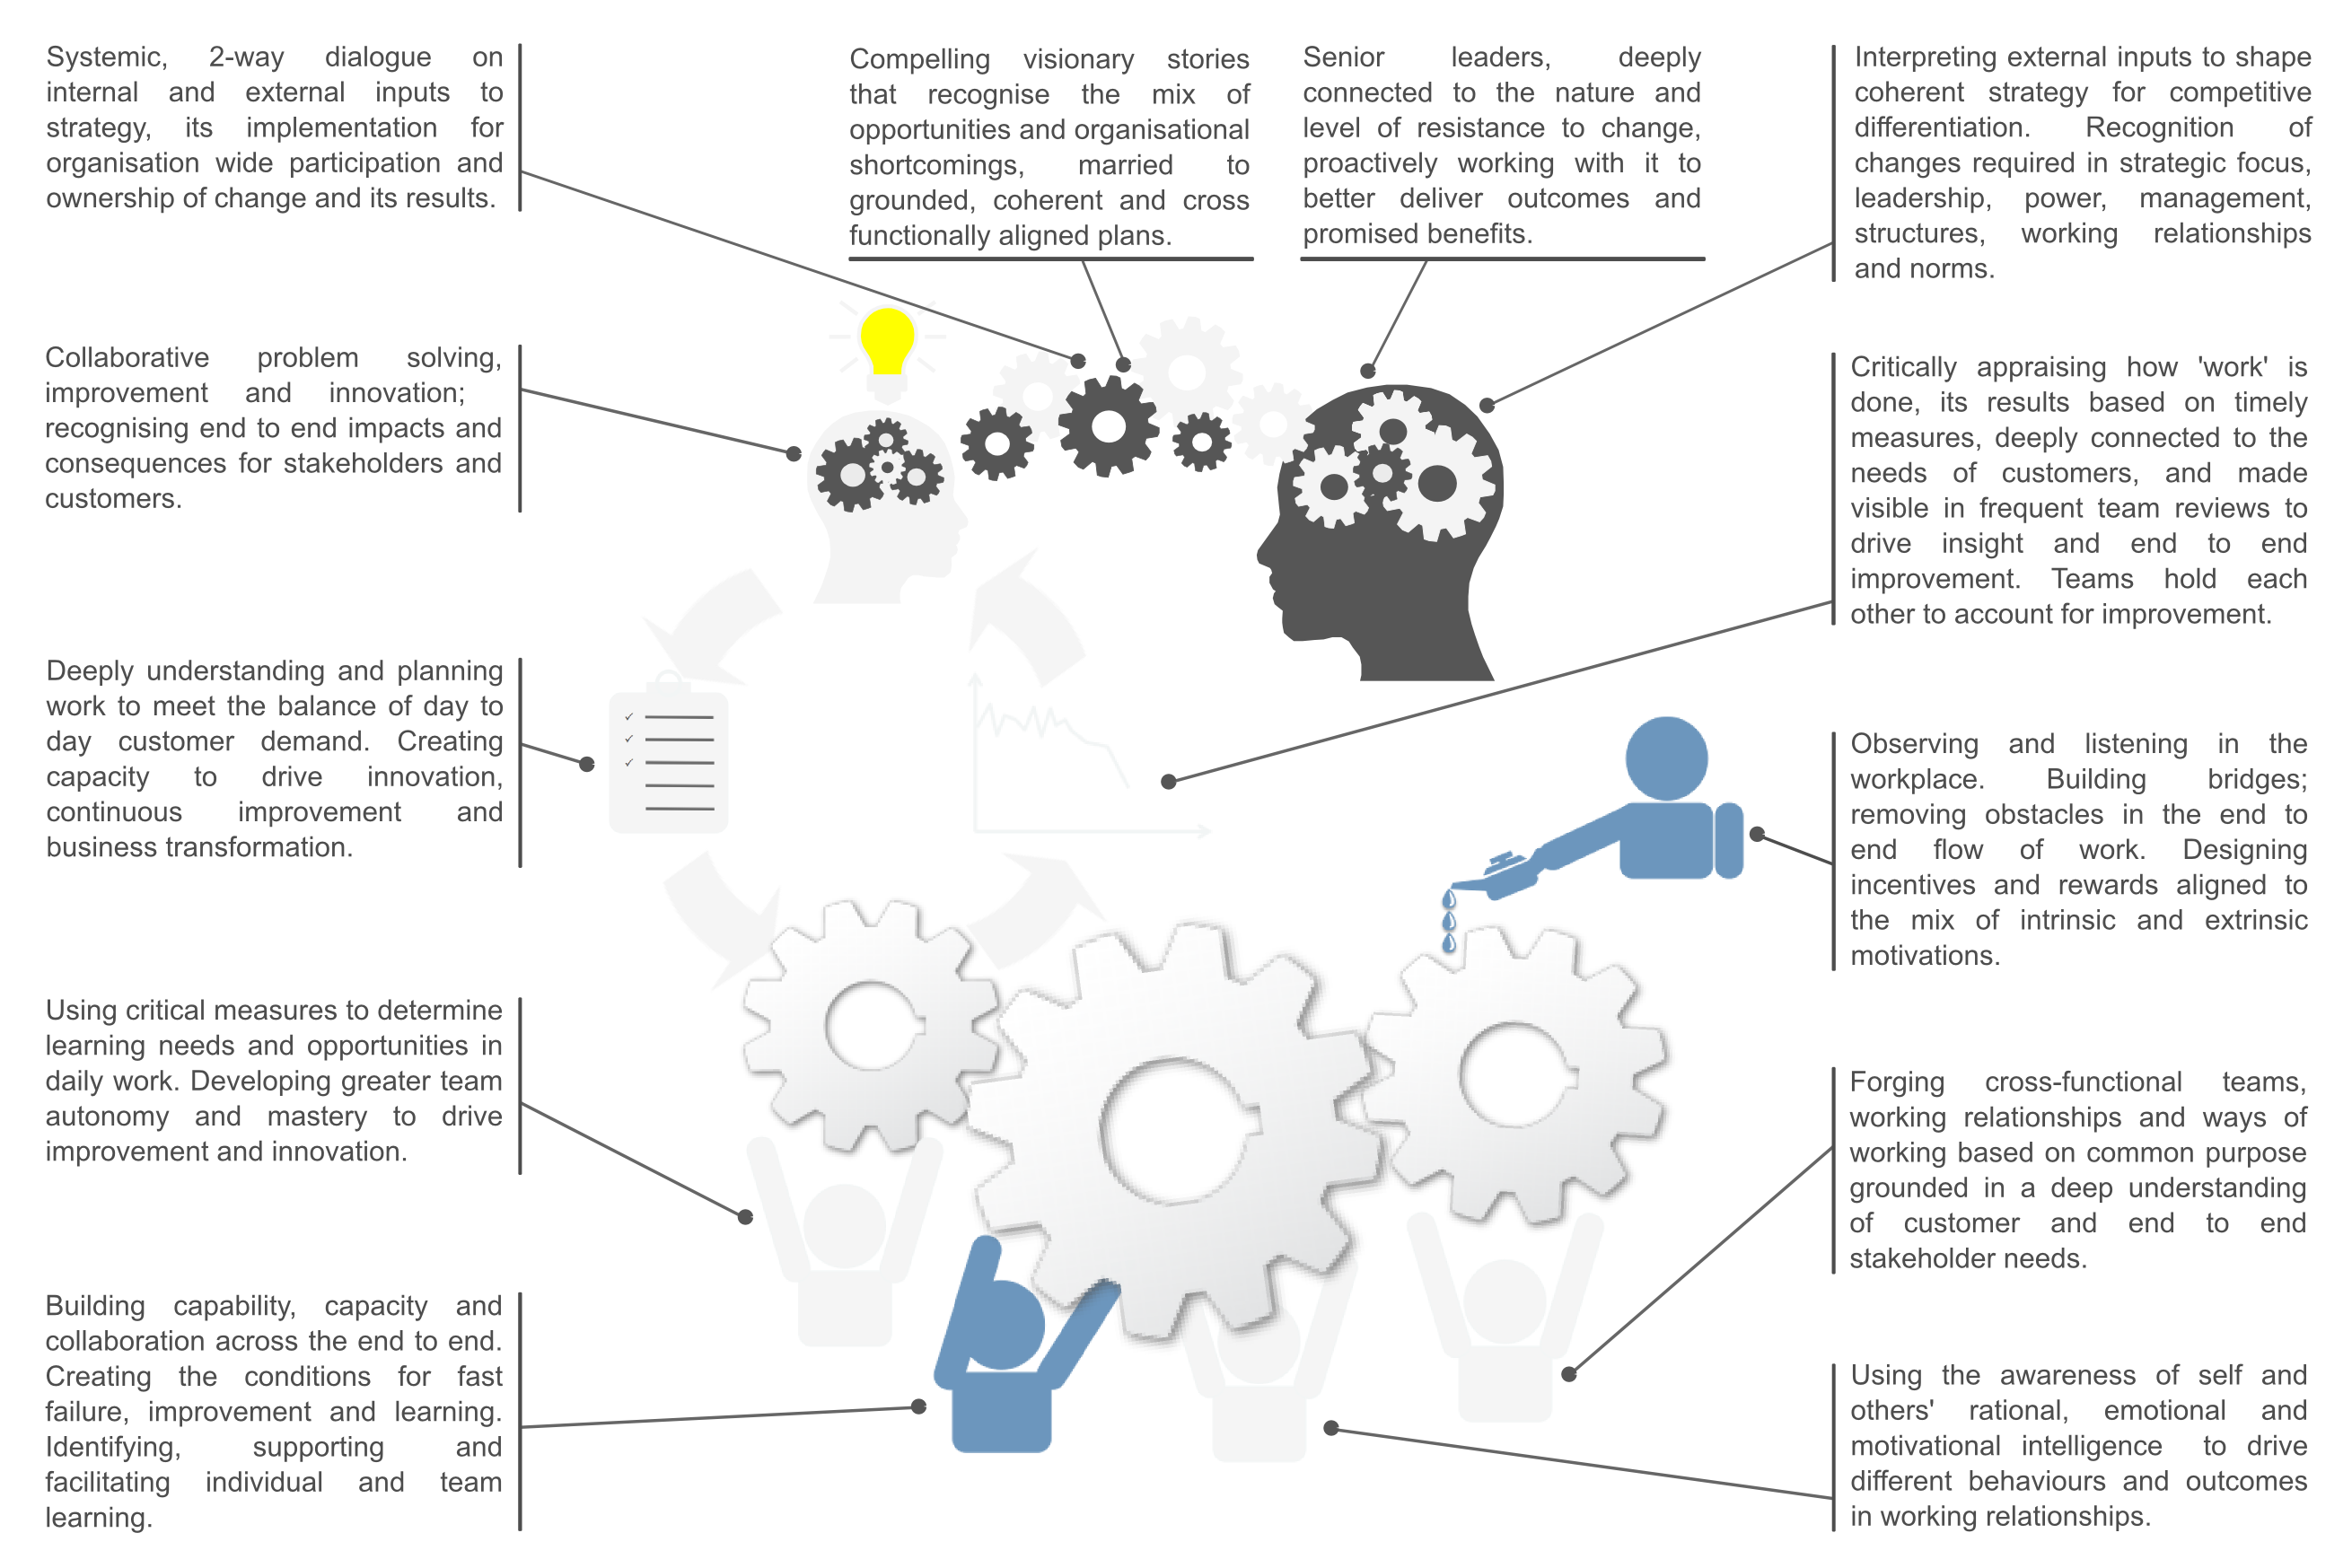 e3: employee engagement system